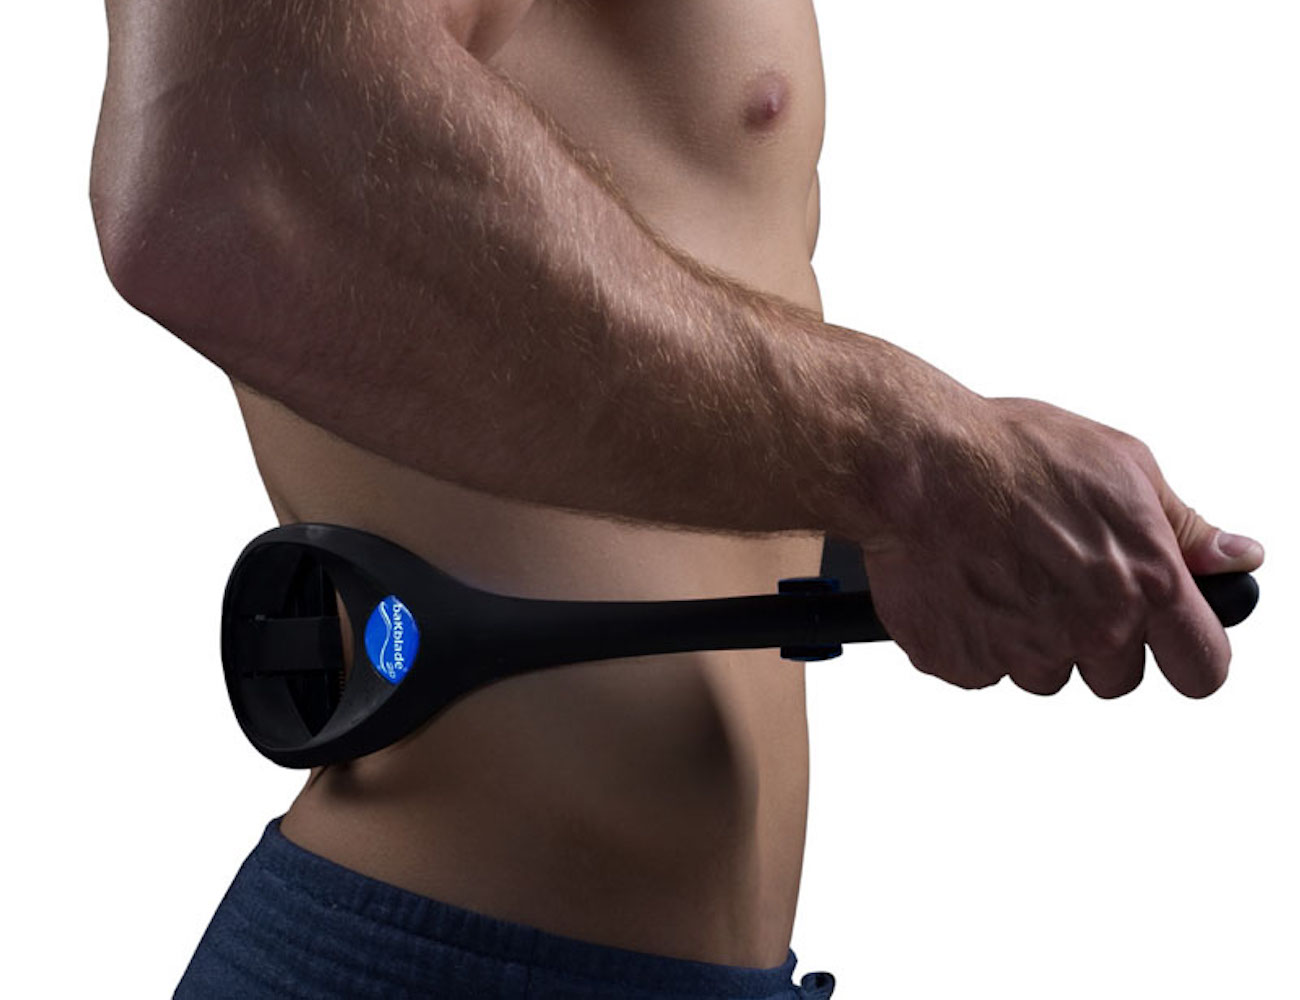 Bakblade 2.0 Back and Body Shaver